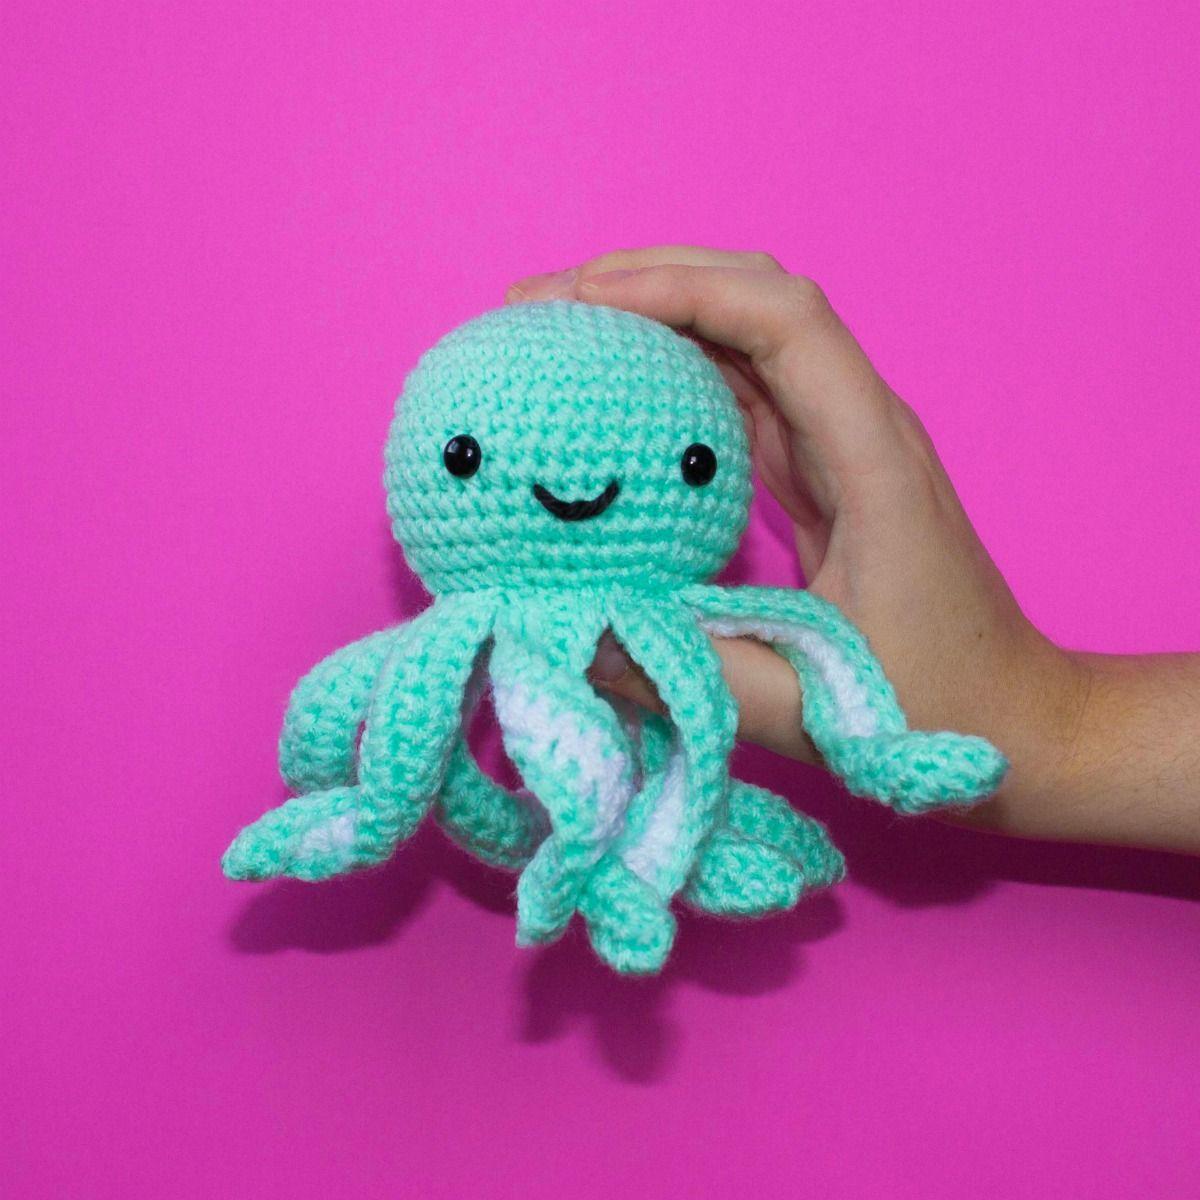 Free Crochet Pattern For Mini Octopus Octopus Crochet Pattern Octopus Crochet Pattern Free Crochet Octopus